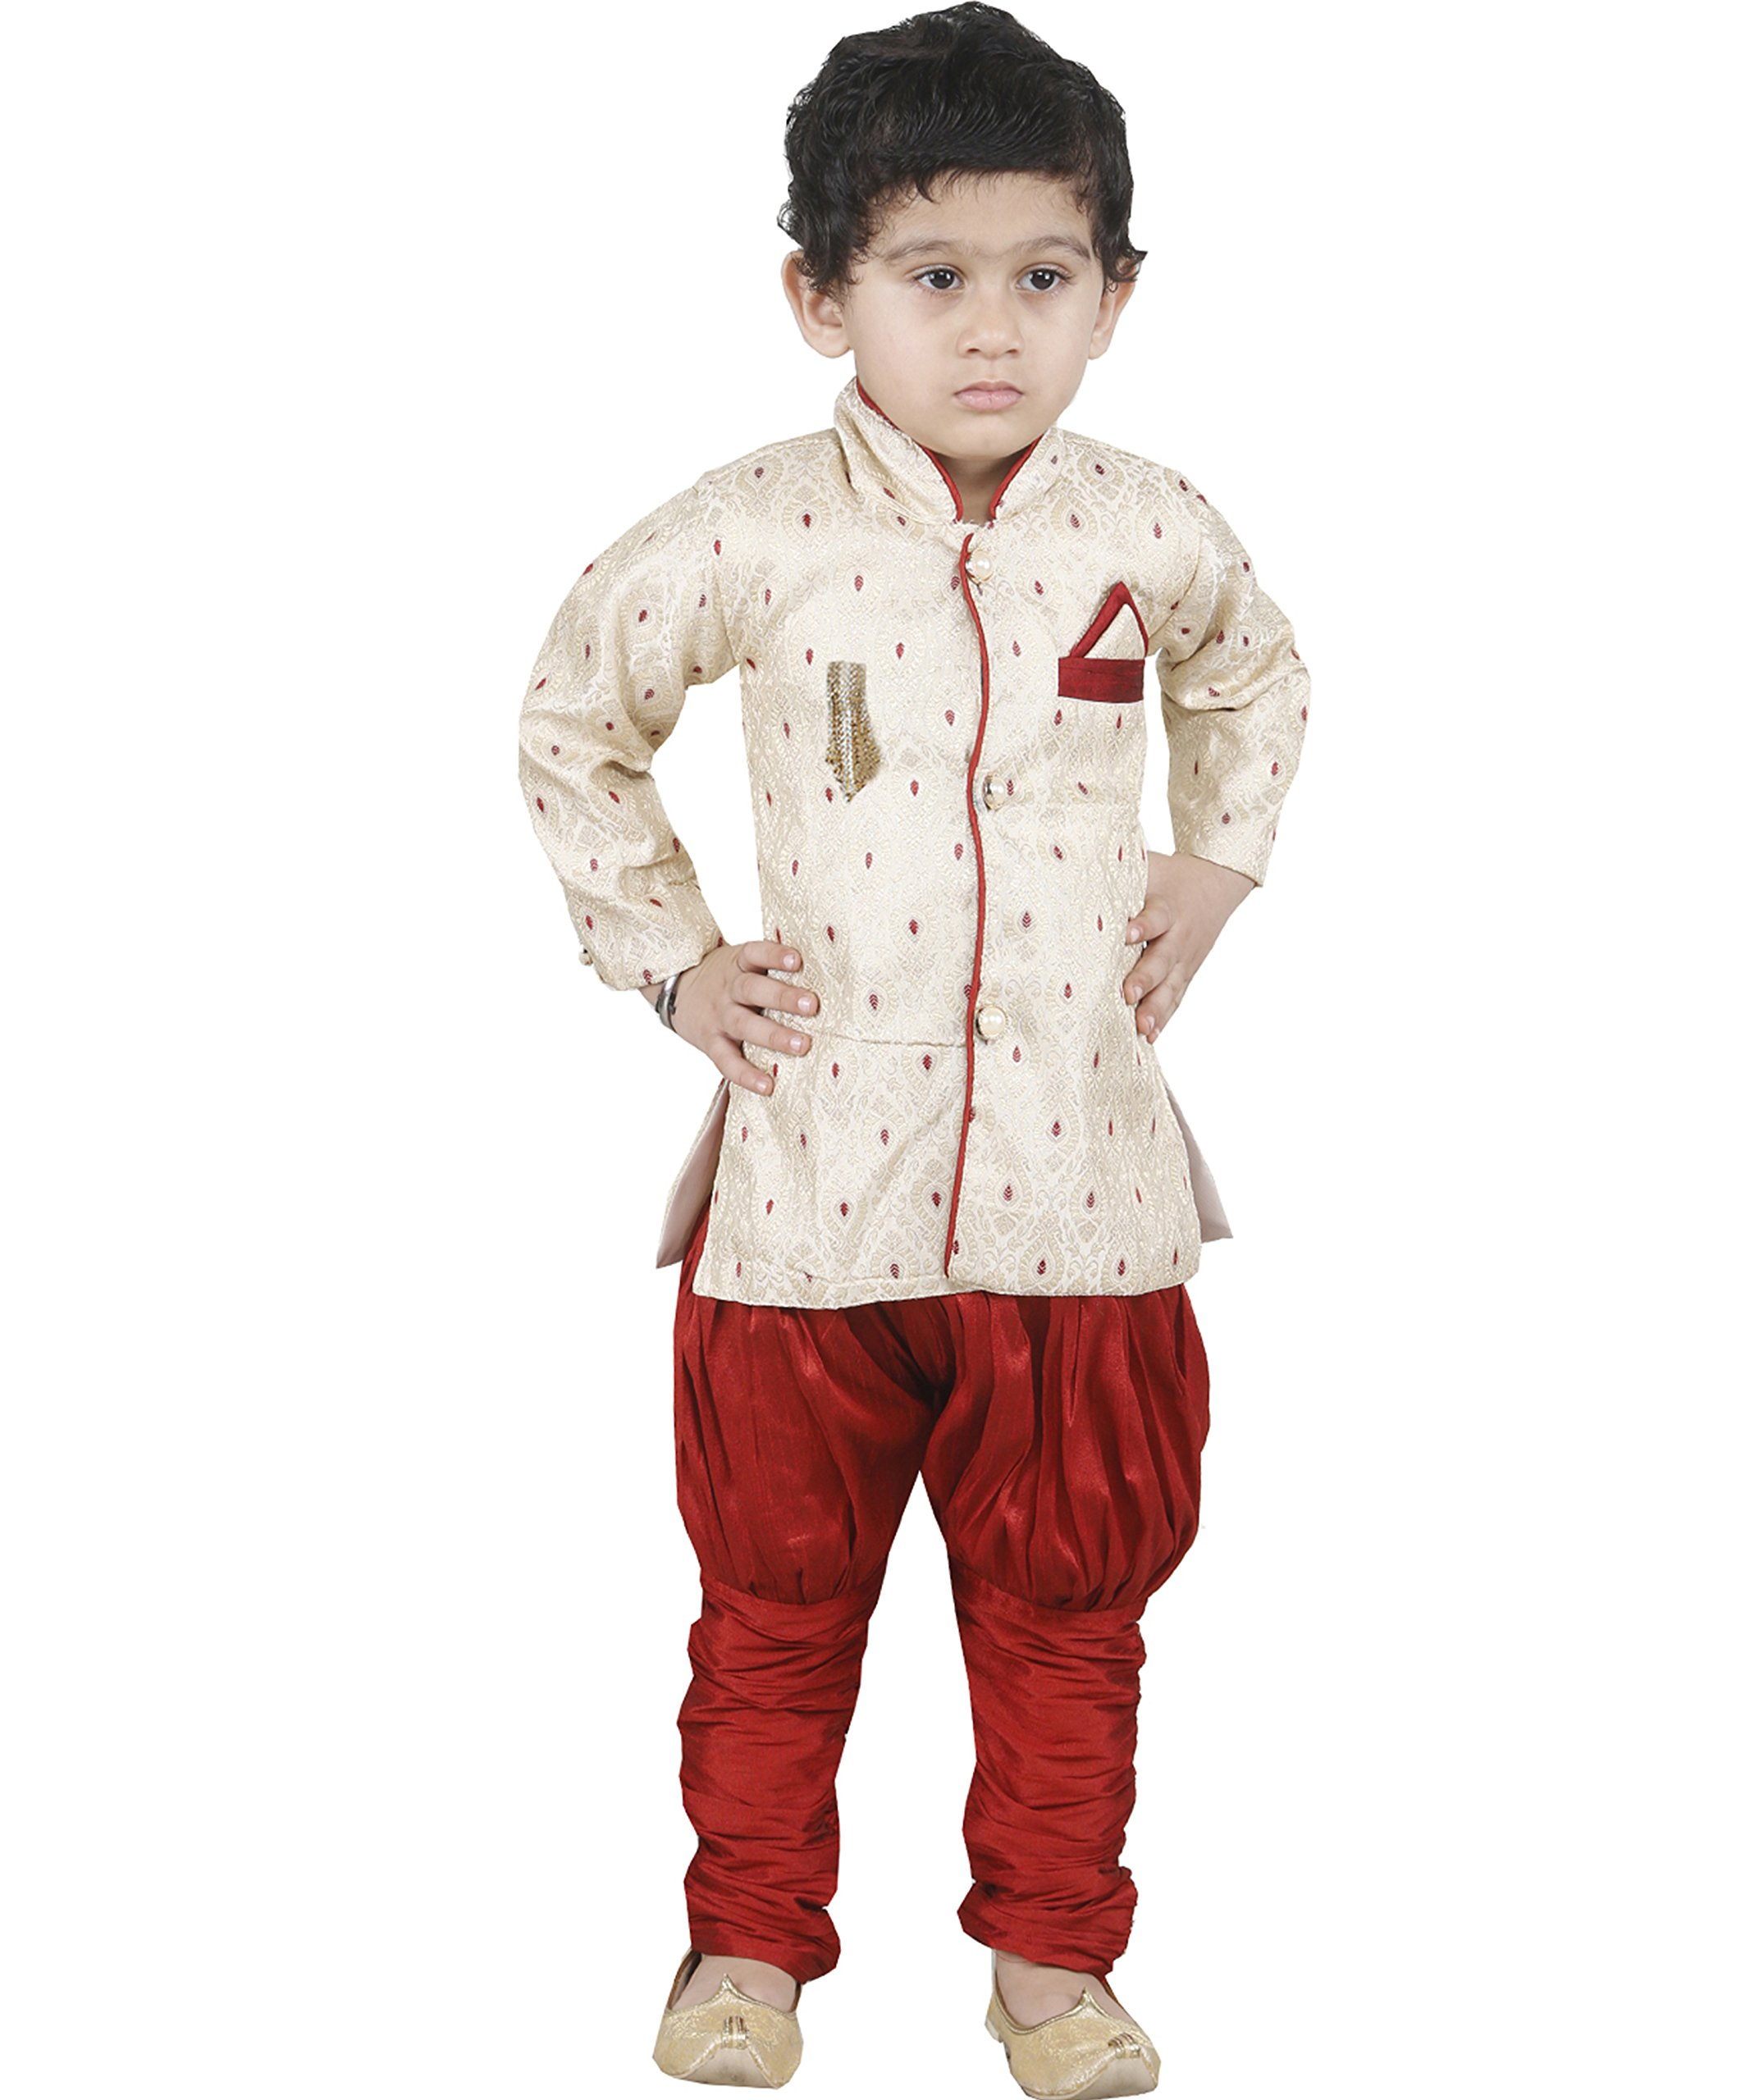 JBN Creation Boys Beige Banarasi Cotton Silk Kurta Pyjama With Jodhpuri Breeches (Size: 6-12 Months)